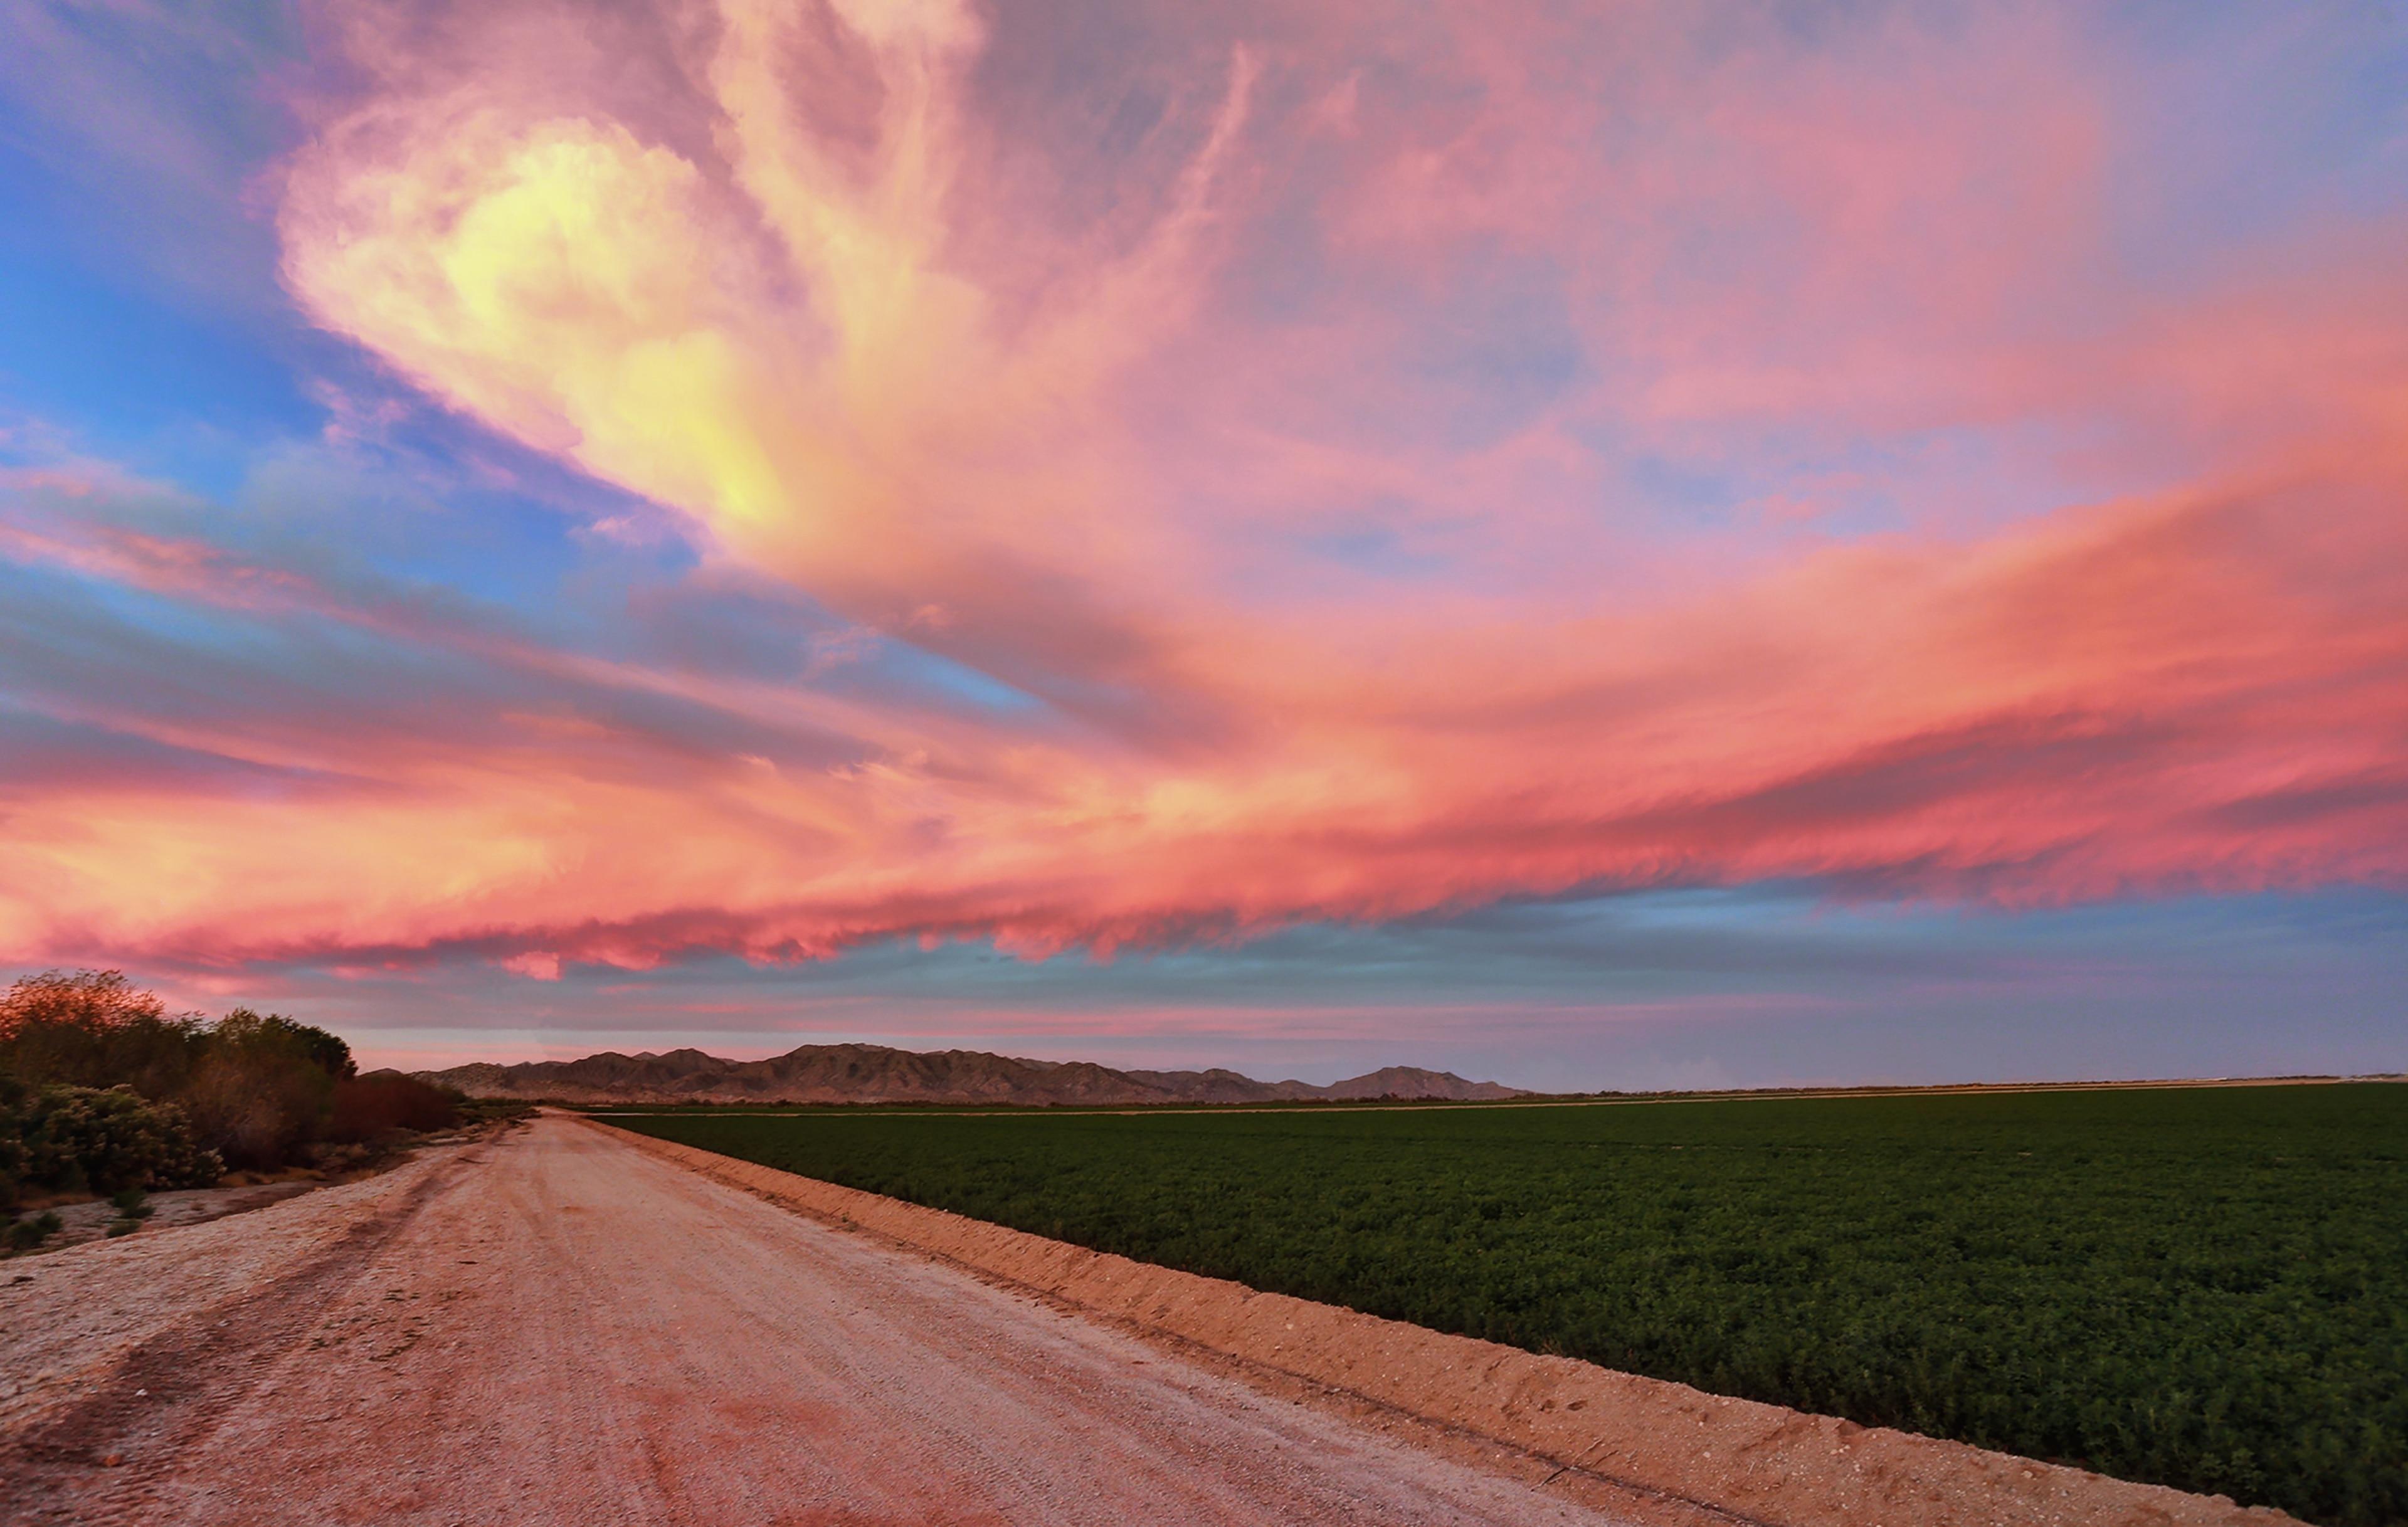 Buckeye, Arizona, United States of America